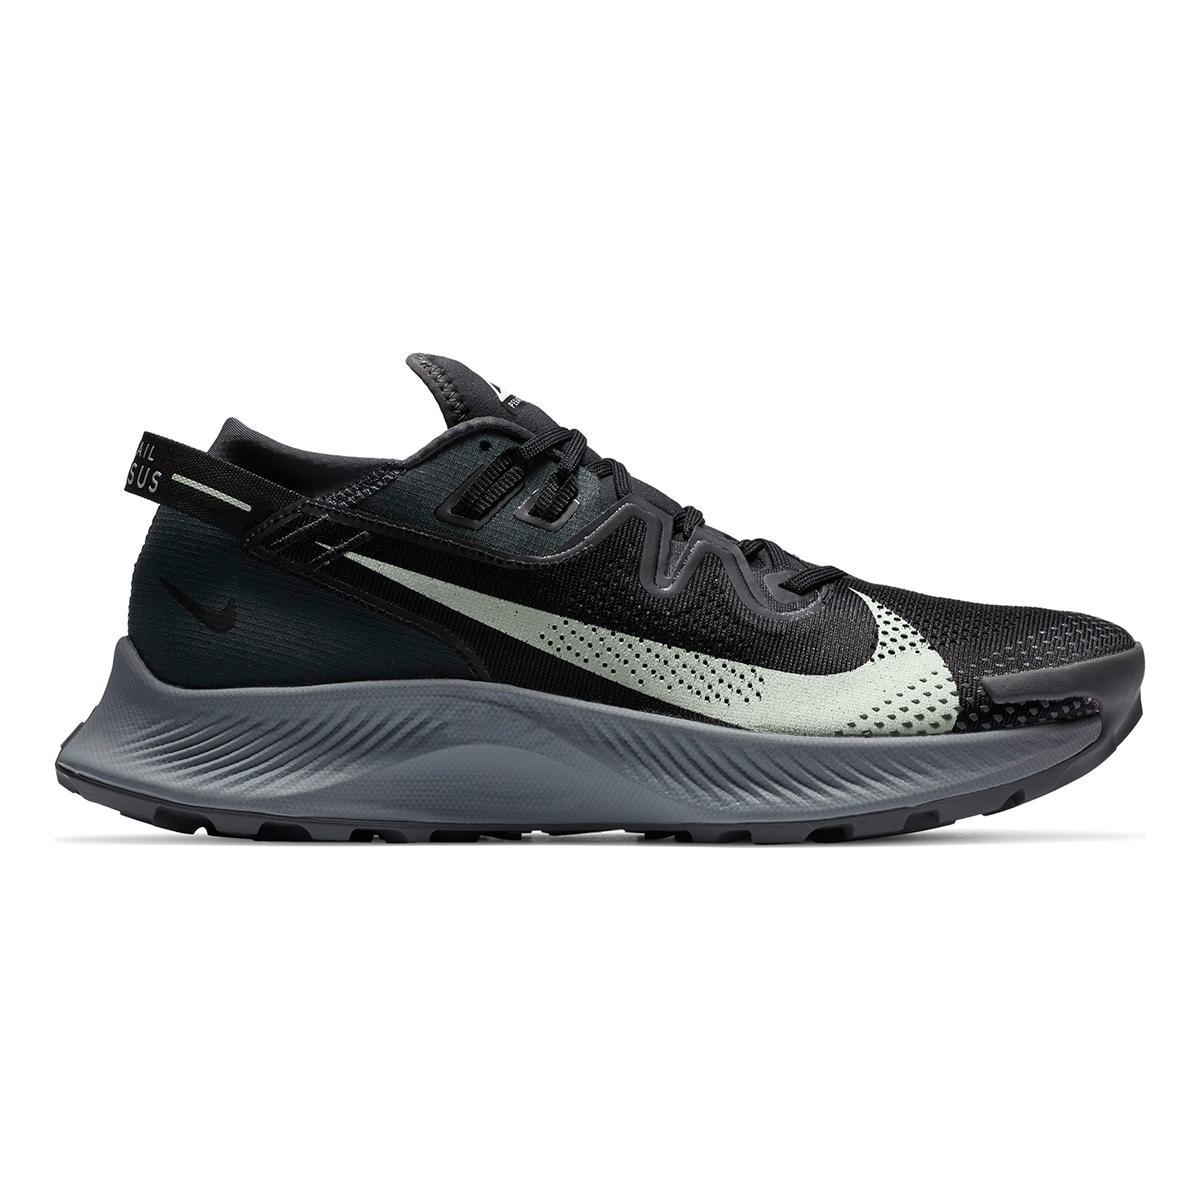 Men's Nike Pegasus Trail 2 Trail Running Shoe - Color: Black/Dark Smoke Grey/Particle Grey/Spruce Aura - Size: 6 - Width: Regular, Black/Dark Smoke Grey/Particle Grey/Spruce Aura, large, image 1